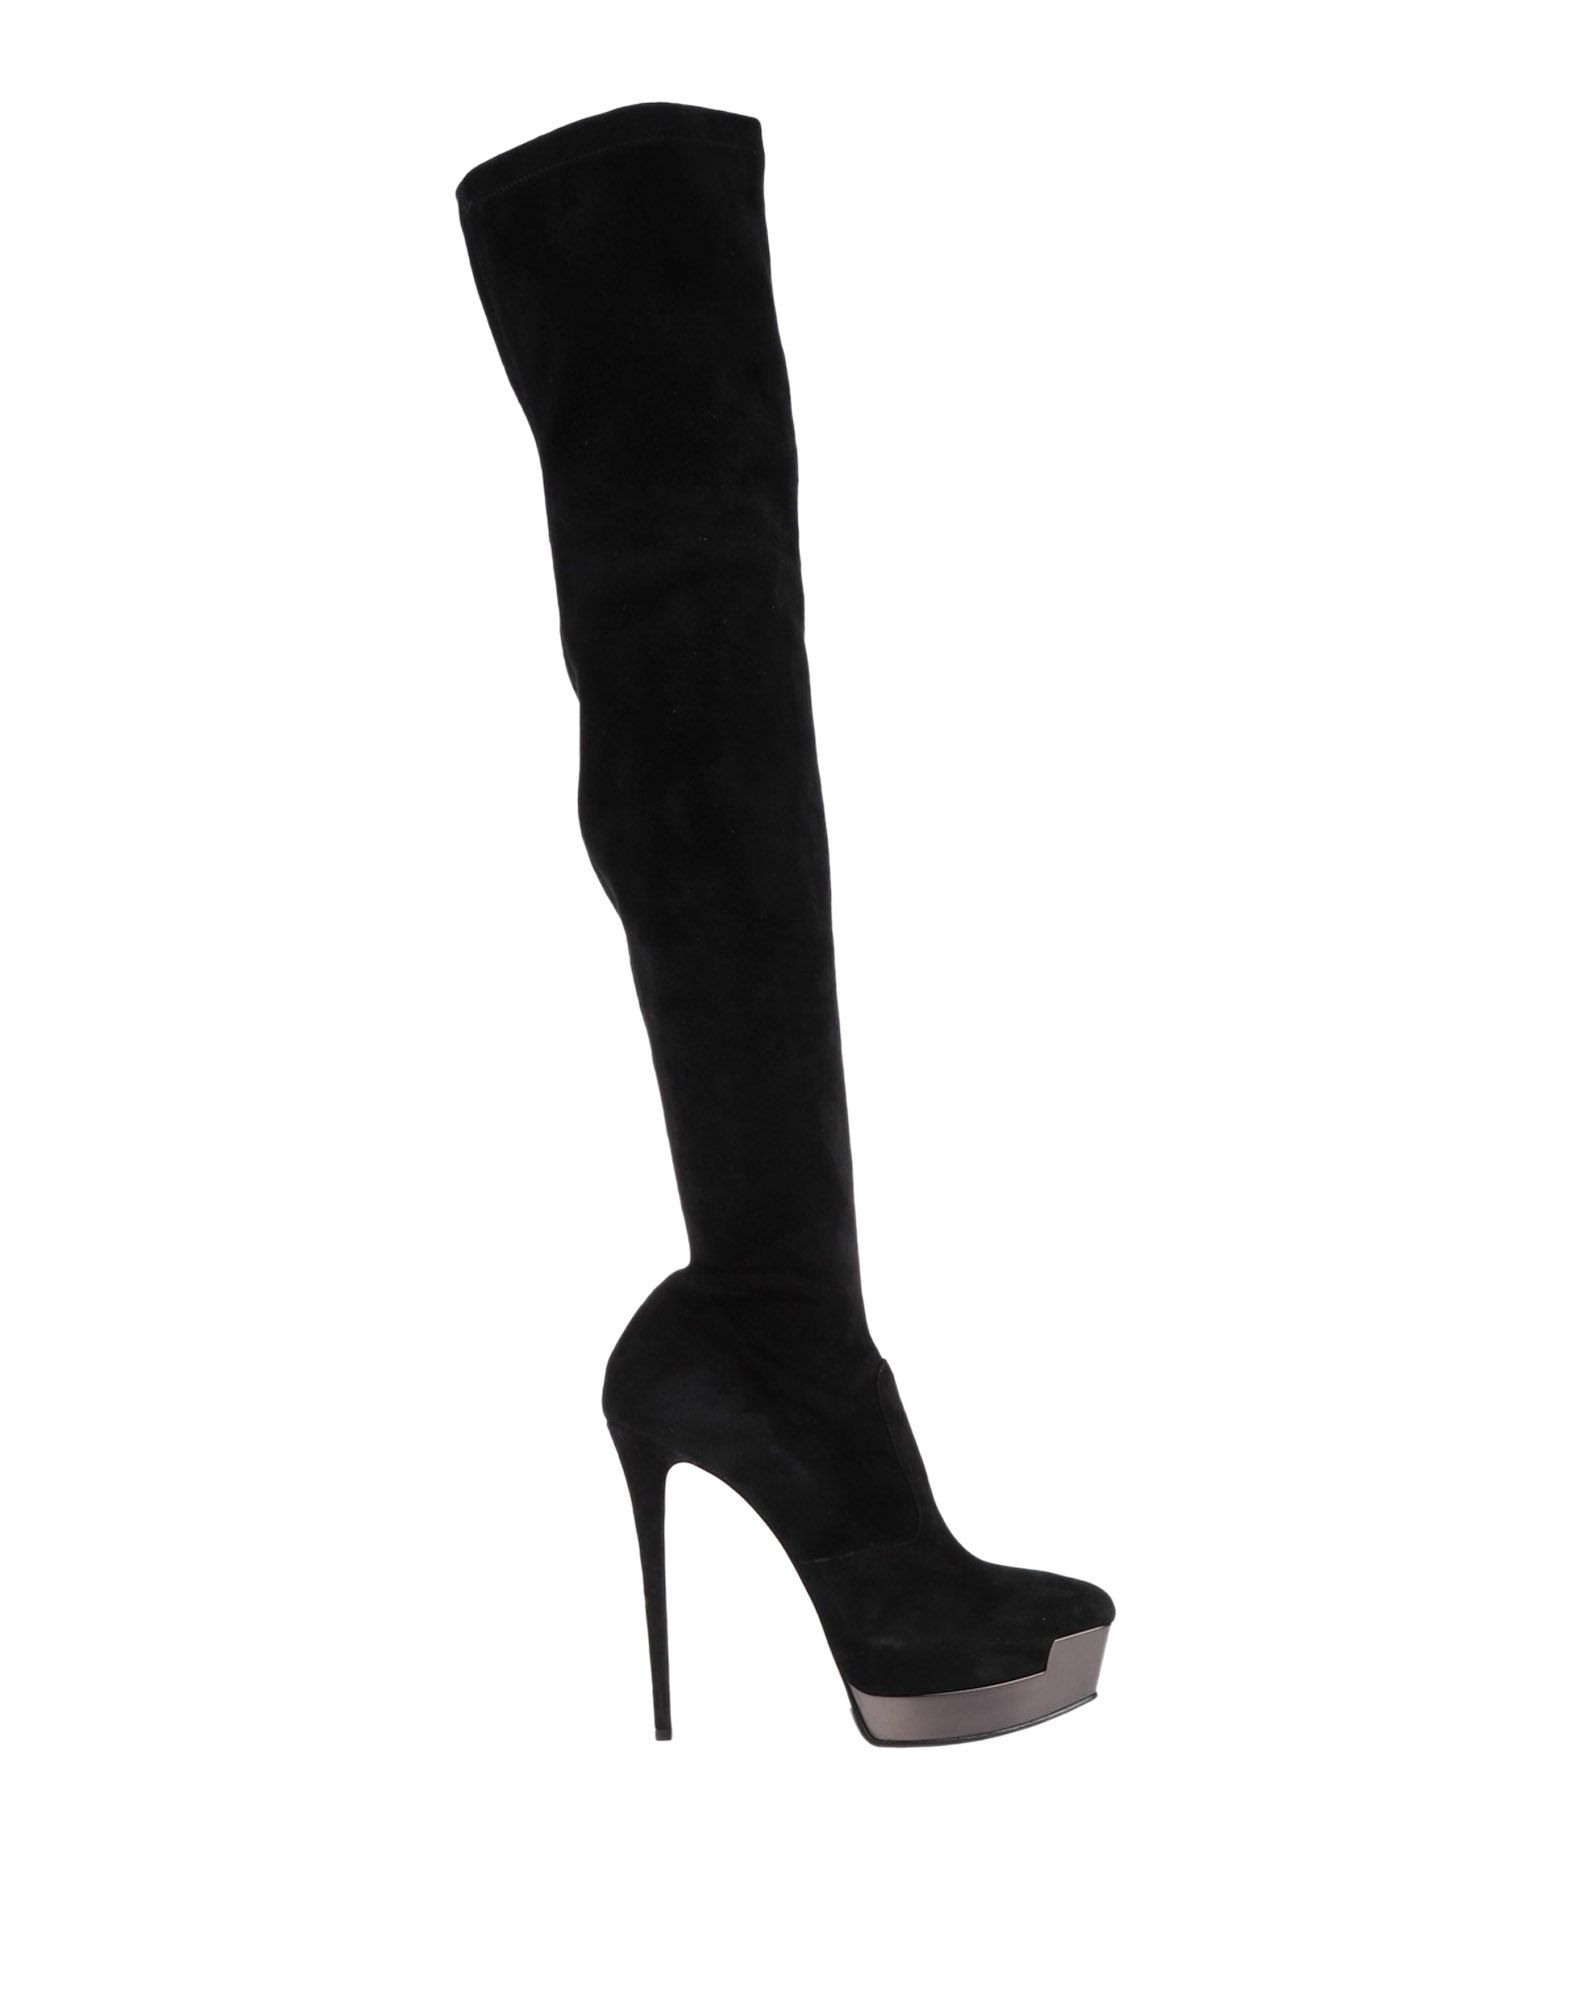 Le Silla Boots Boots - Women Le Silla Boots Boots online on  United Kingdom - 11527244CG 66964b